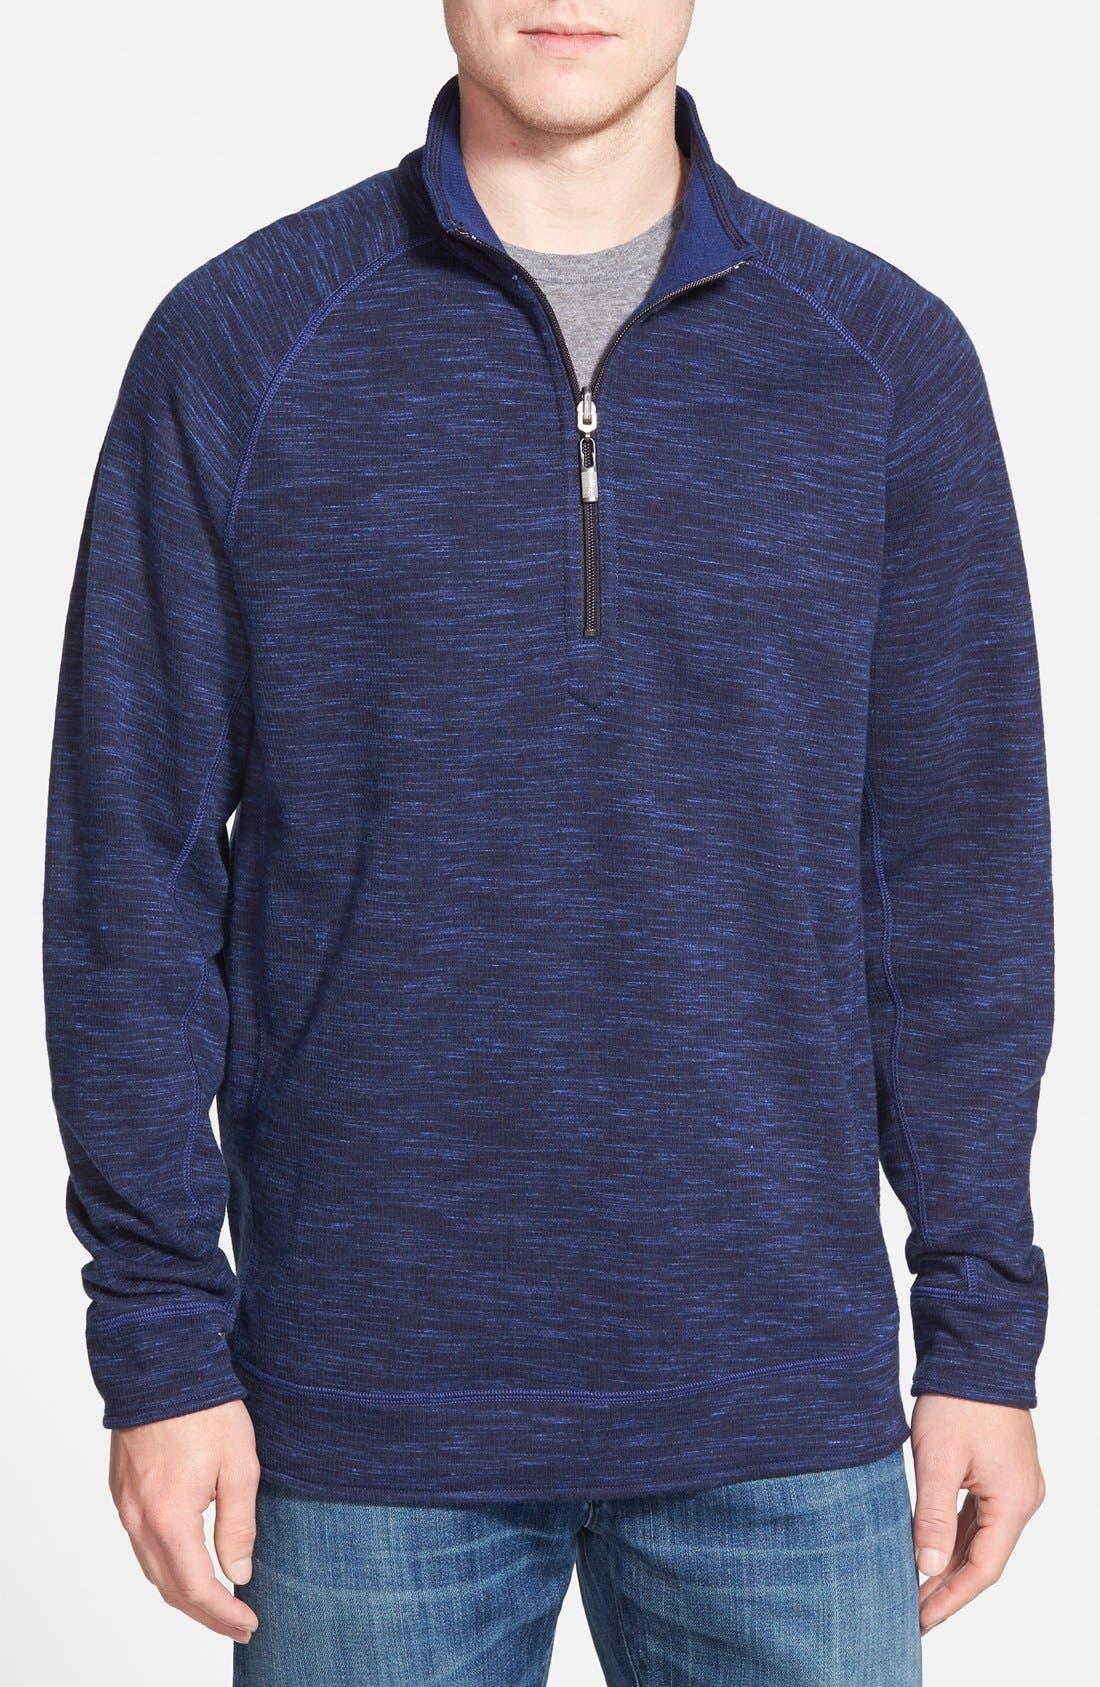 Main Image - Tommy Bahama Slubtropics Reversible Half Zip Pullover